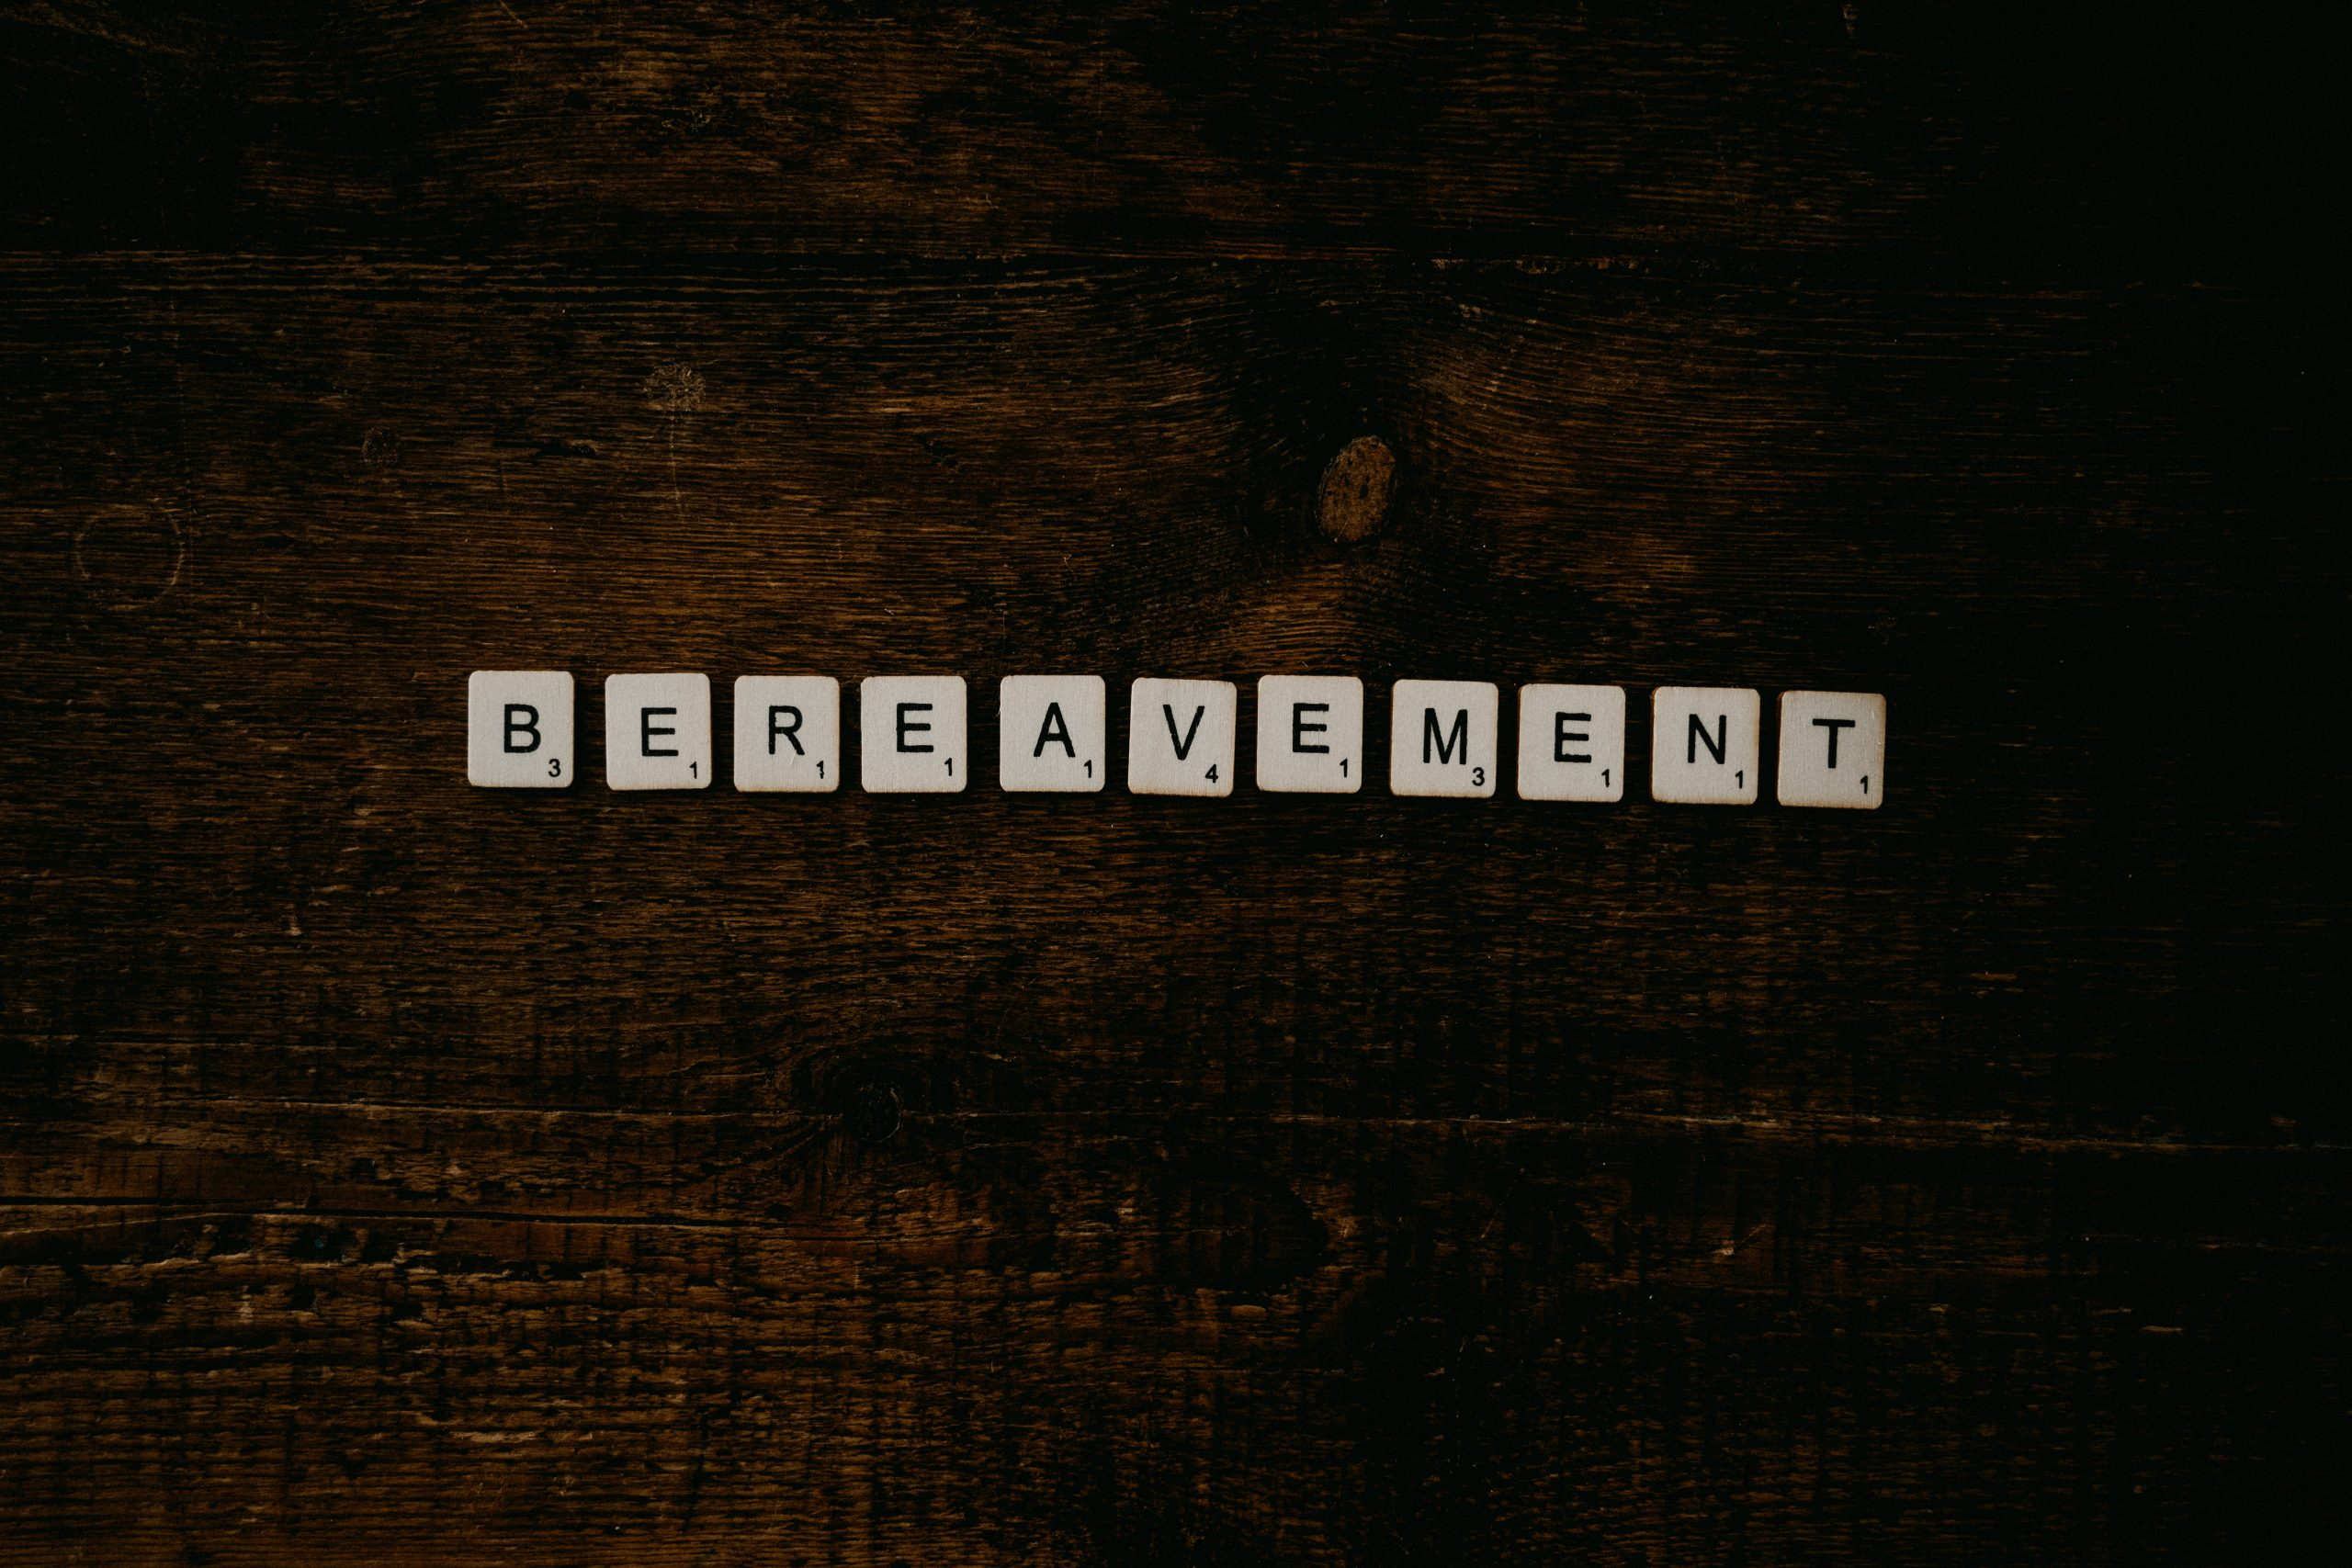 bereavement spelled out in letter tiles